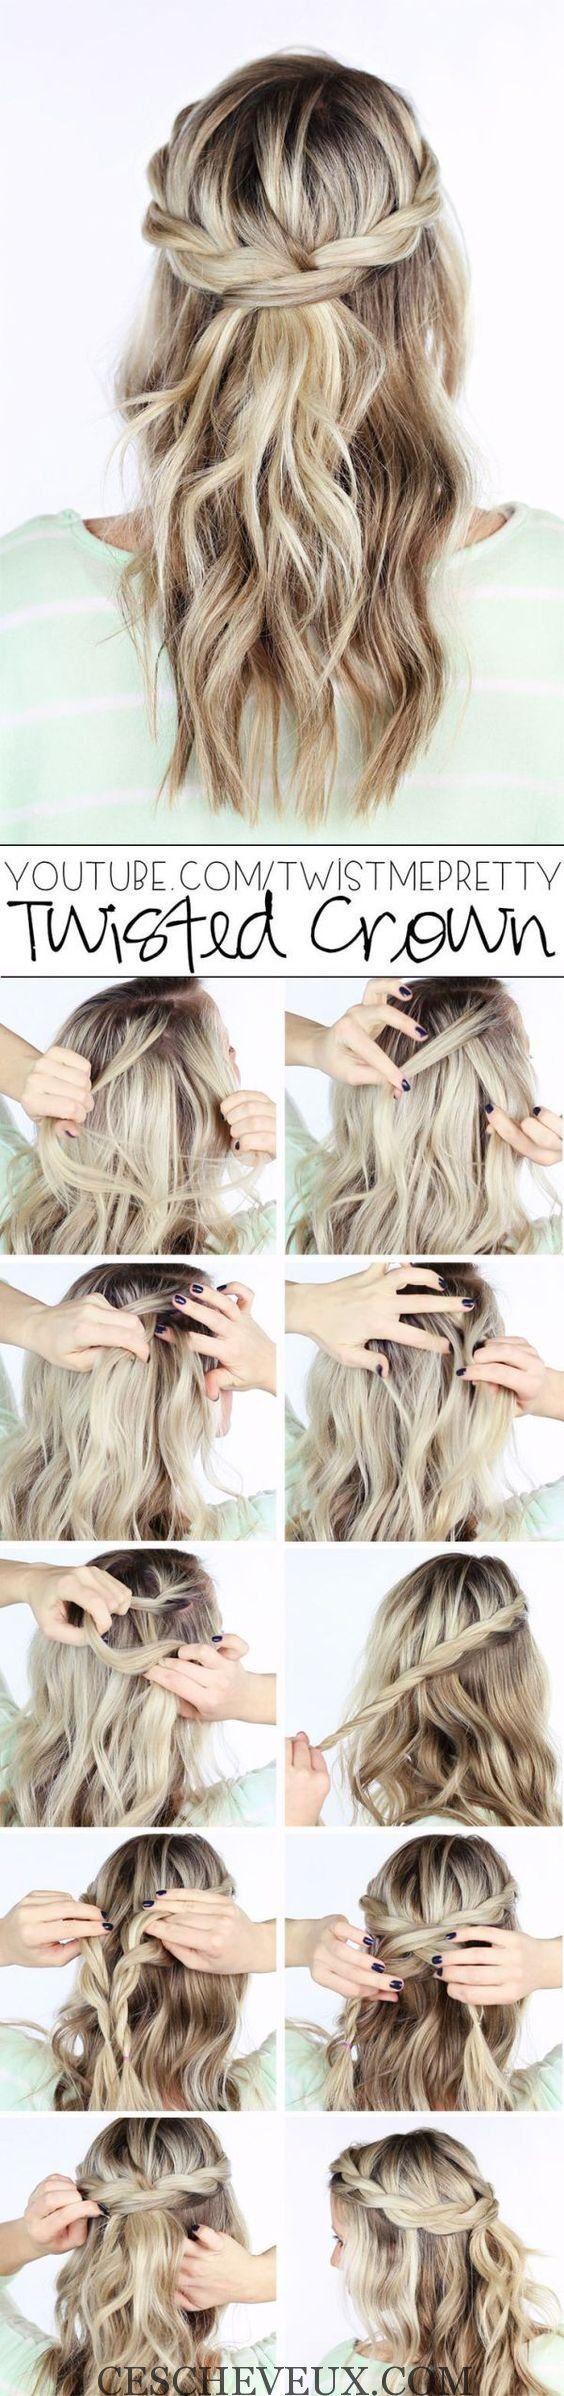 Coiffure proyectos que intentar pinterest knot hairstyles